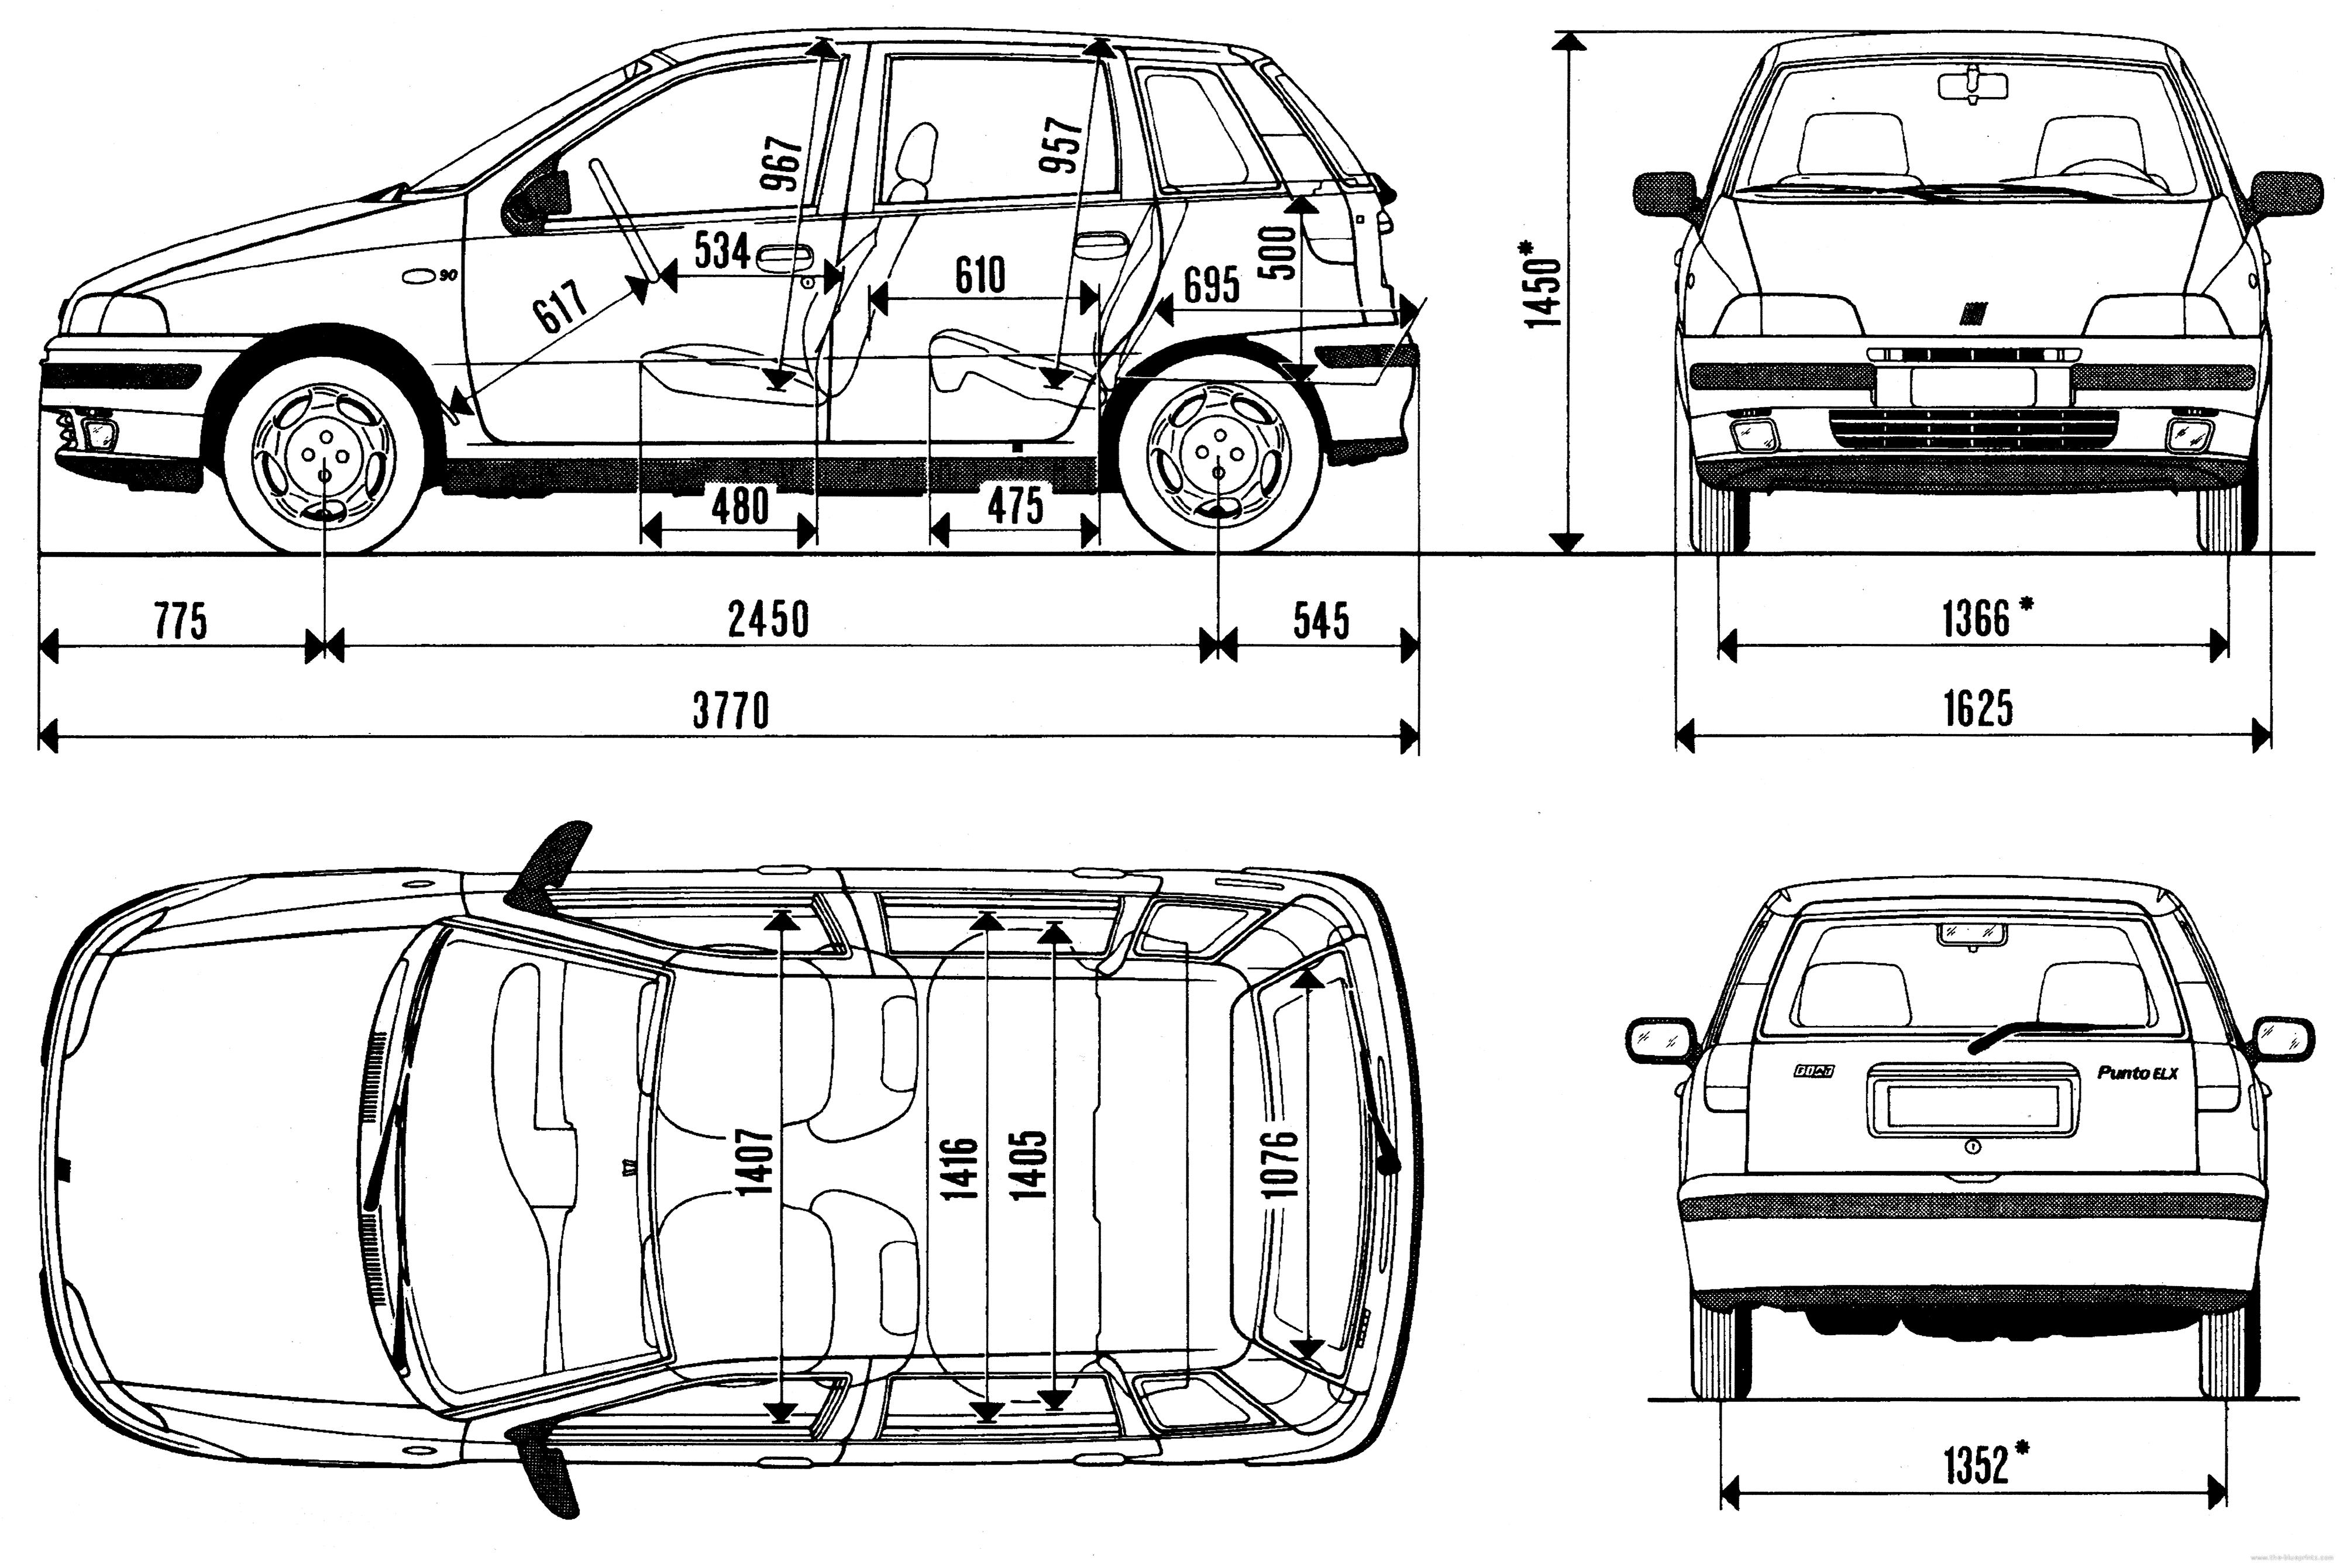 Fiat Punto blueprint